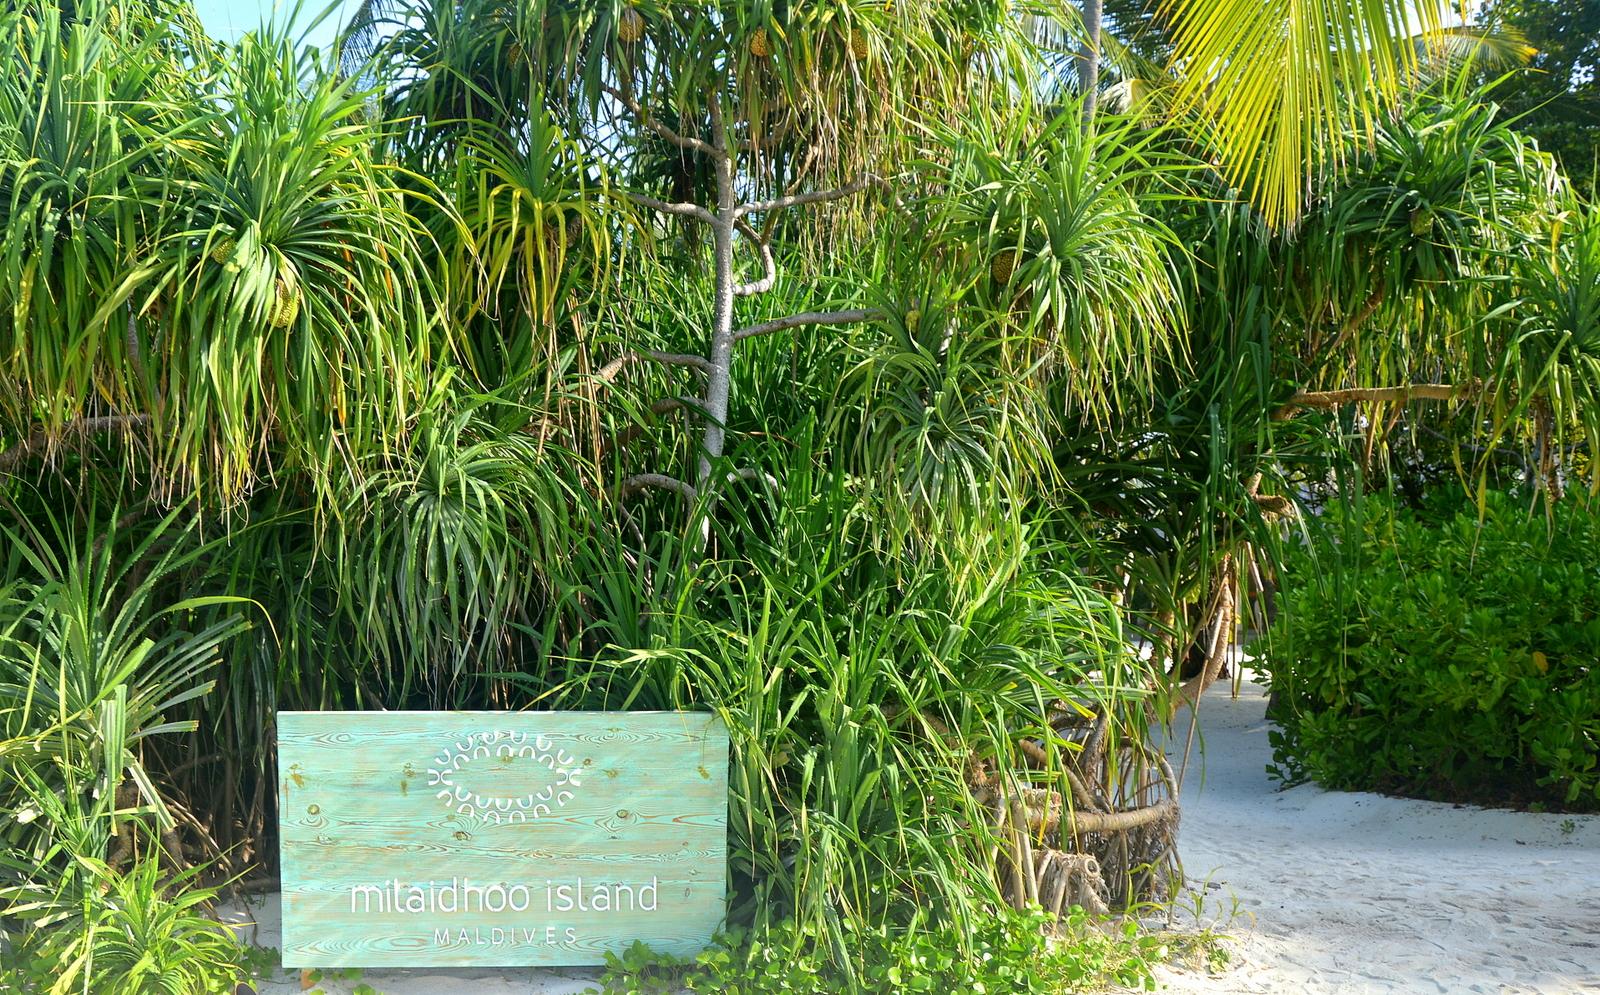 Malediven    die neue Trauminsel Milaidhoo im Baa Atoll strand sonne reisebericht malediven honeymoon 2  TUI Berlin Reisebüro Milaidhoo Island